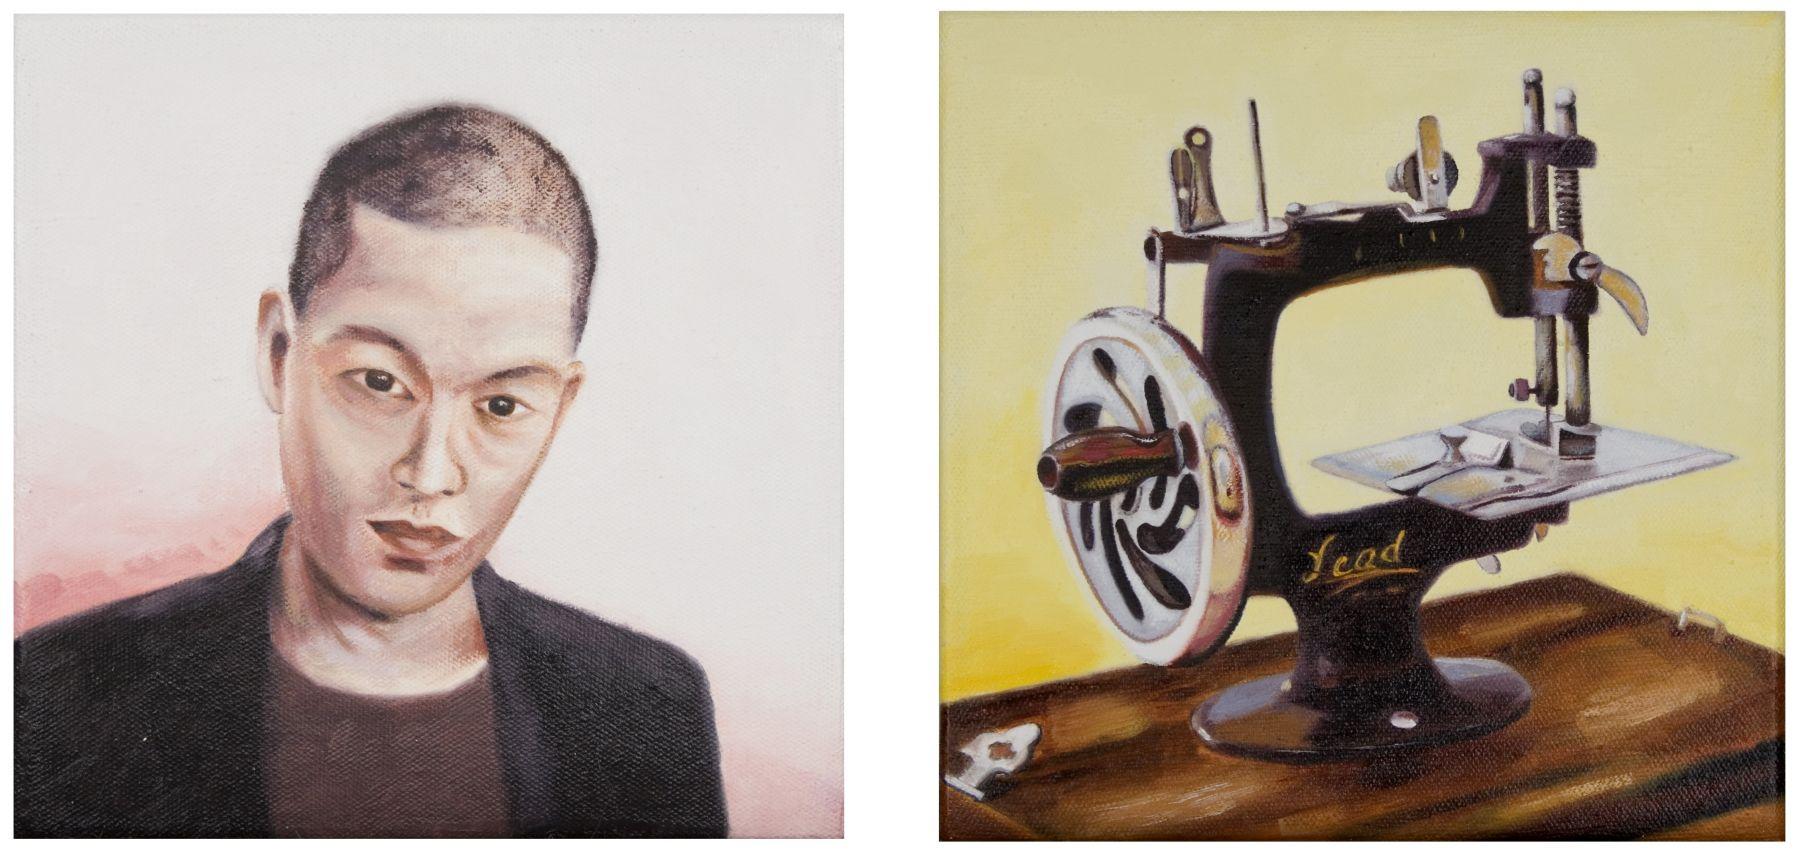 Megan Rye, Jason Wu / Sewing Machine (diptych), 2018, oil on canvas, 8 x 8 inches, each canvas